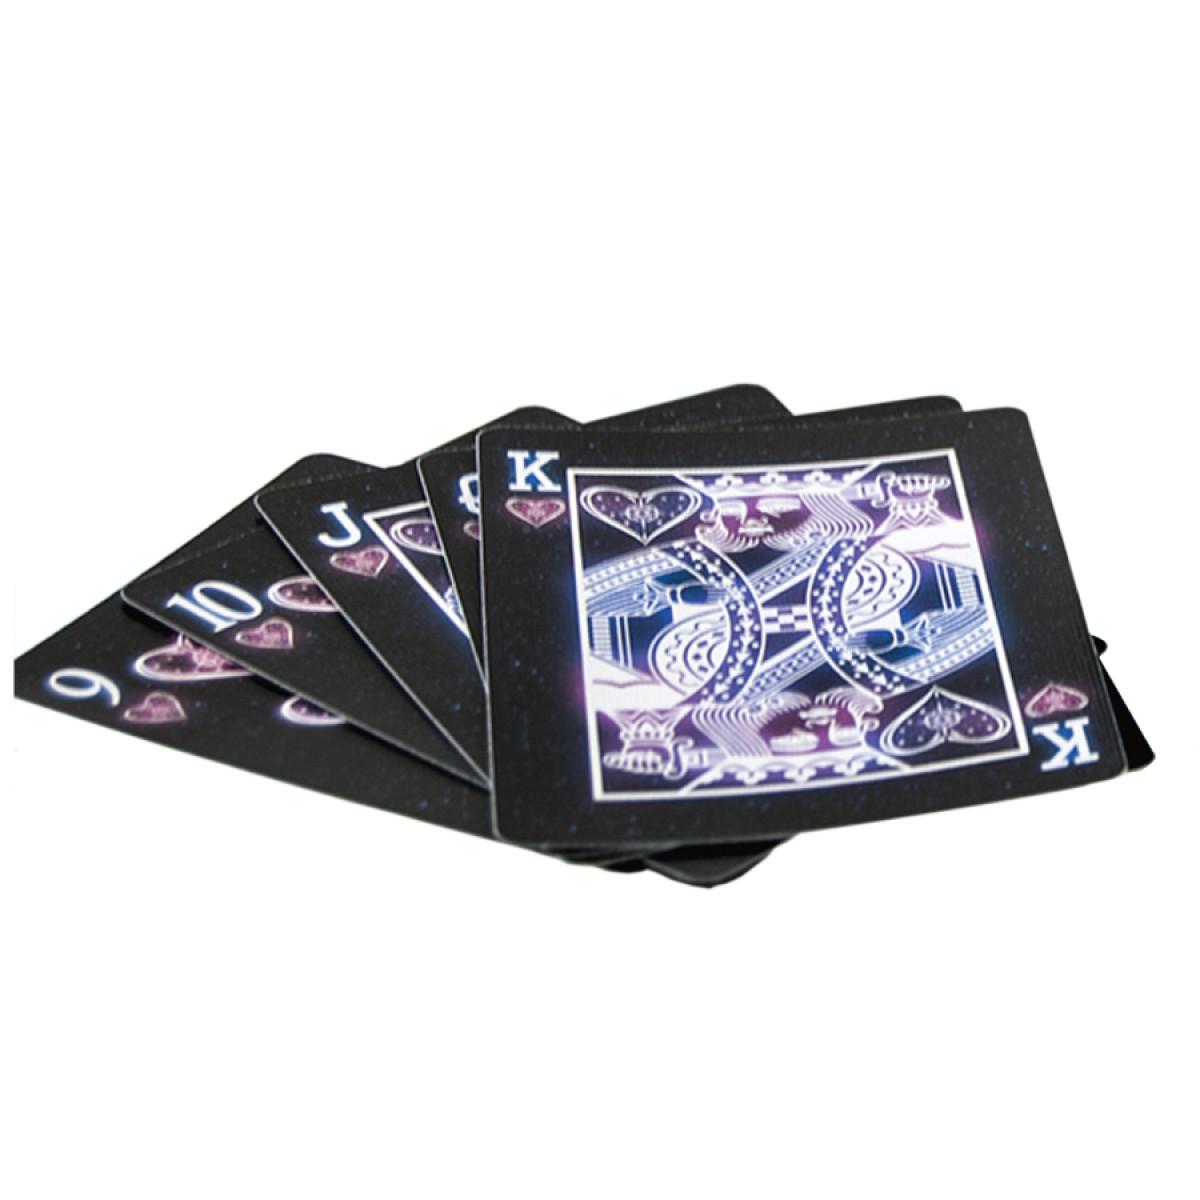 Bicycle Stargazer Bicycle Playing Cards